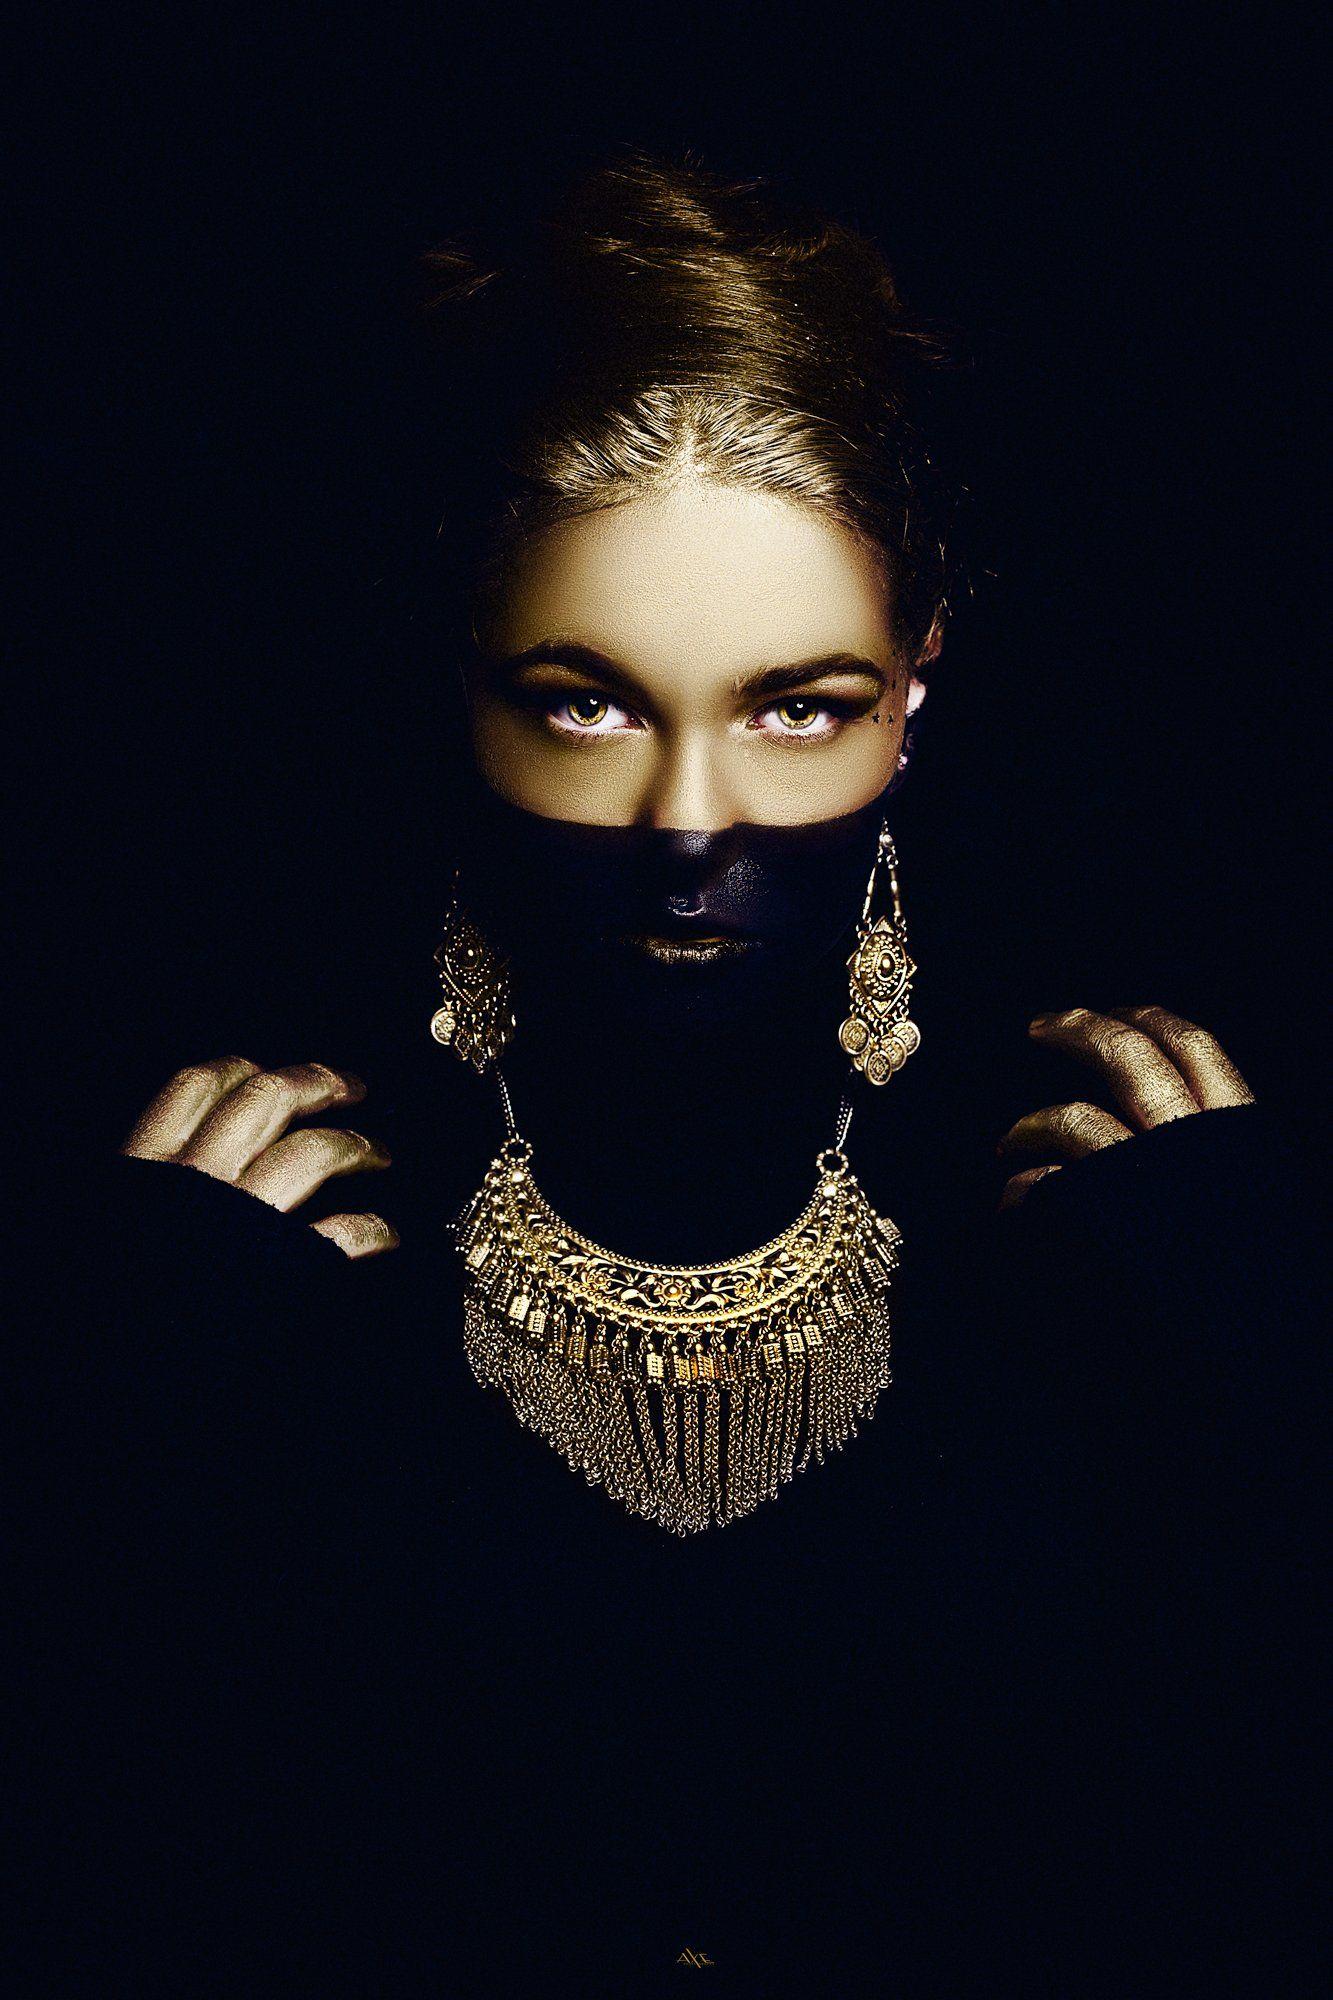 woman, beauty, fashion, art, studio, light, conceptual, Руслан Болгов (Axe)